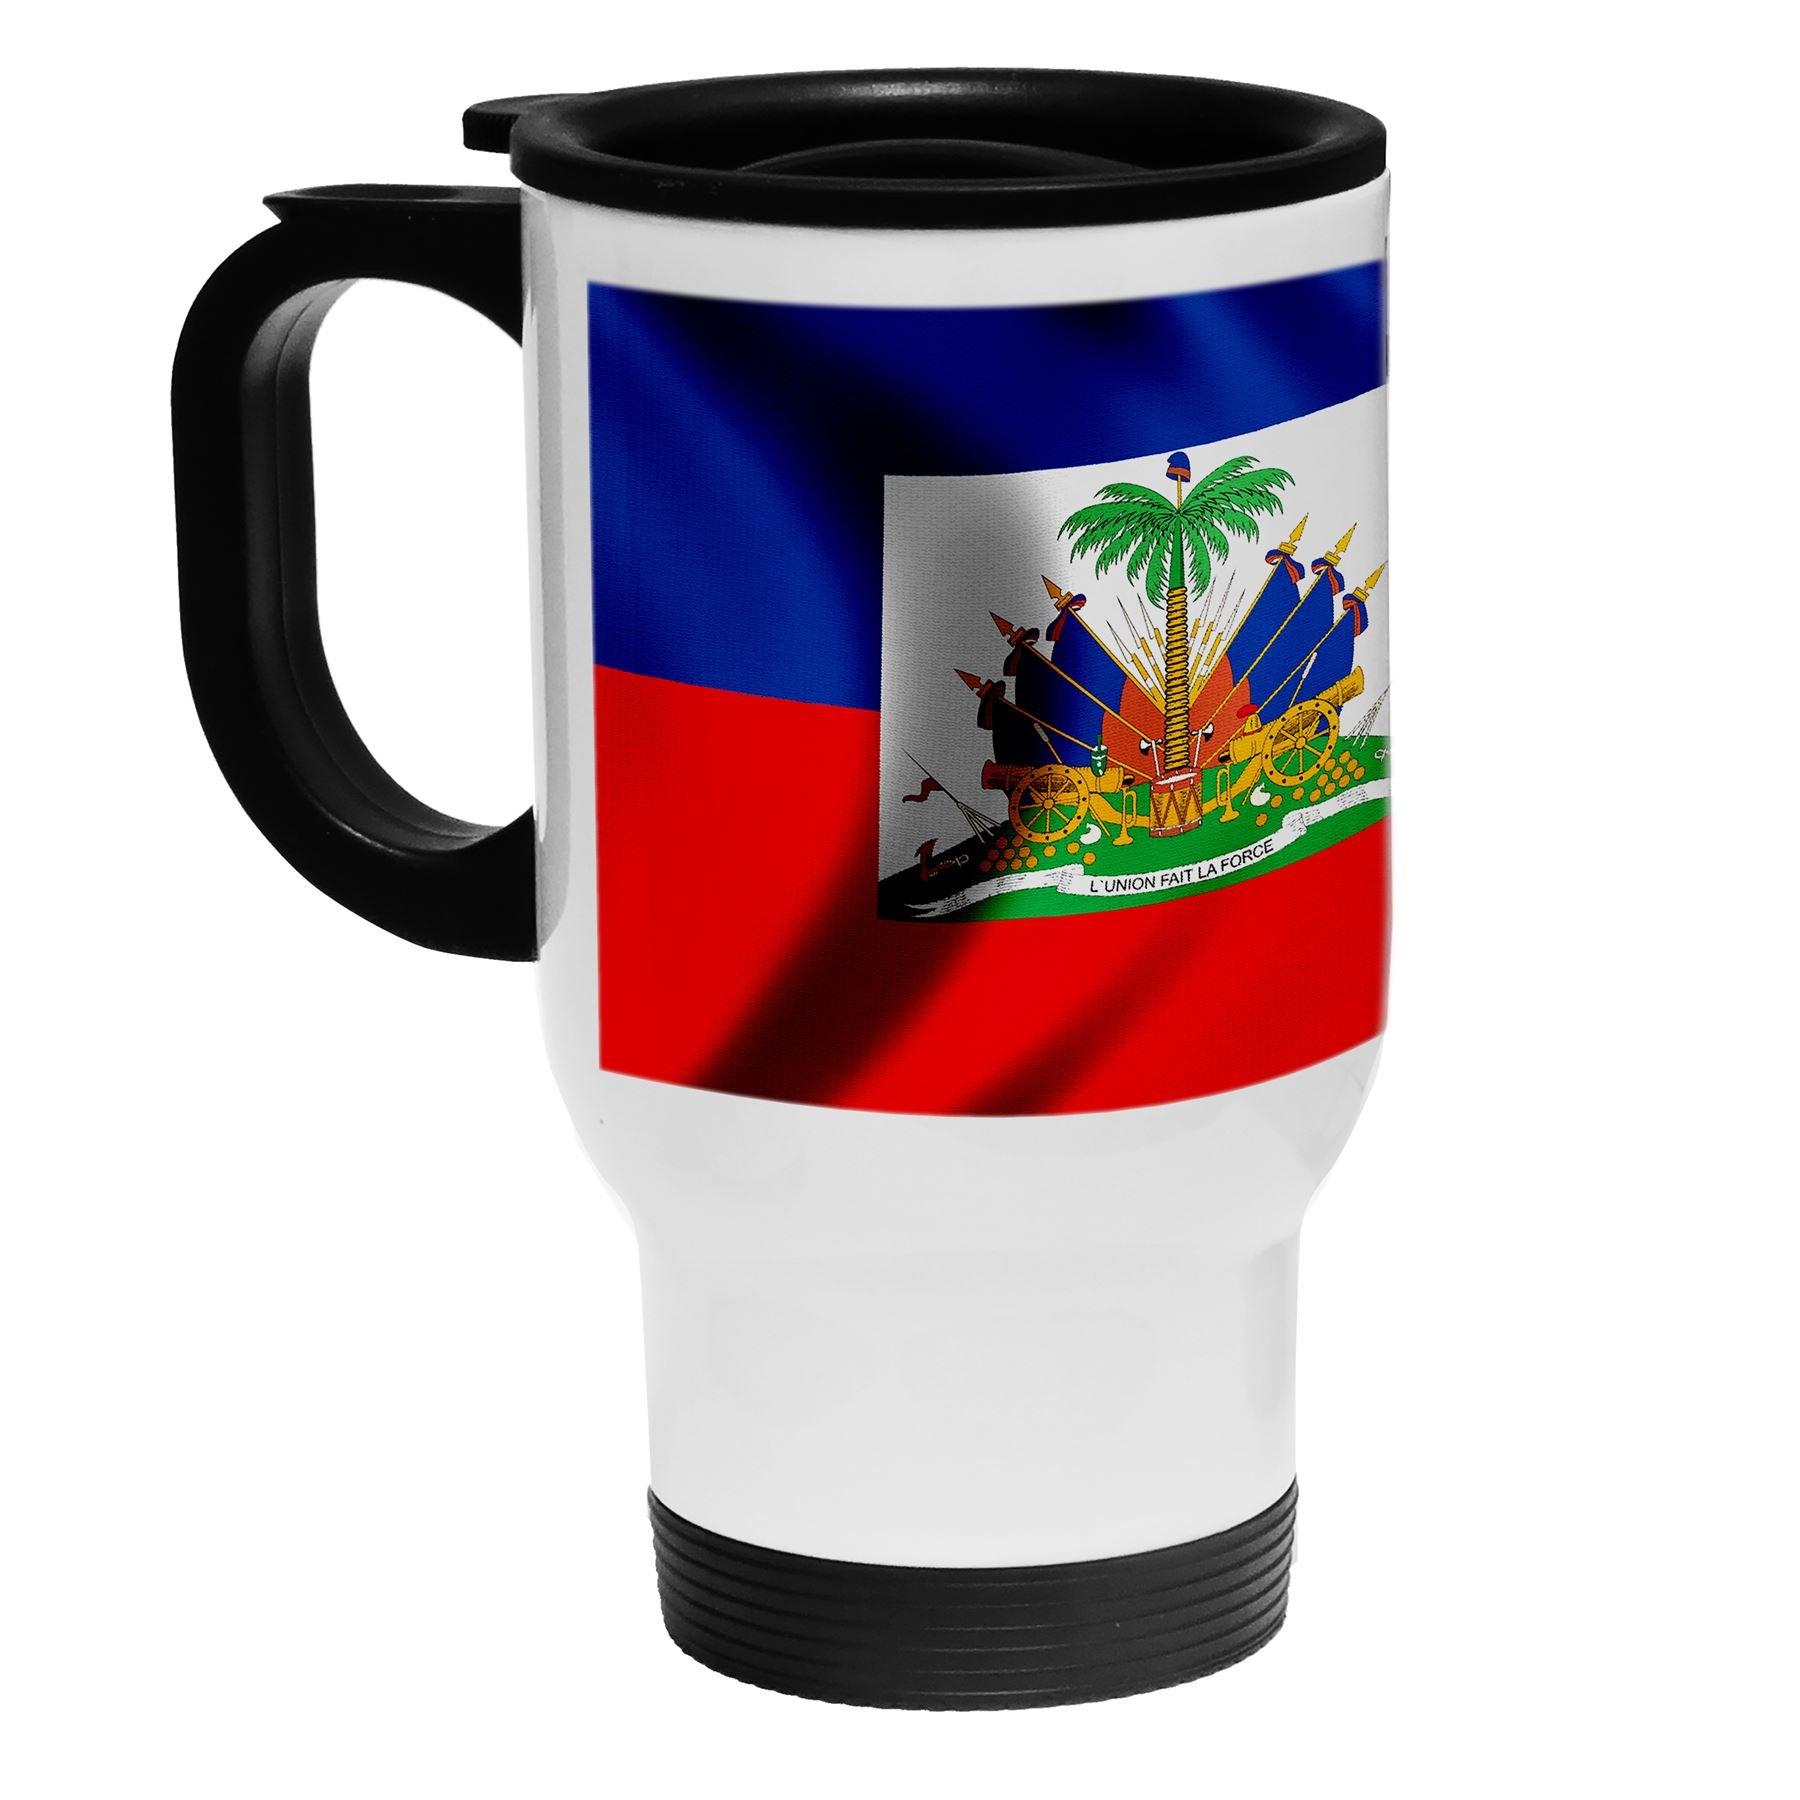 White Stainless Steel Coffee / Travel Mug - Flag of Haiti (Haitian) - Wood/USA